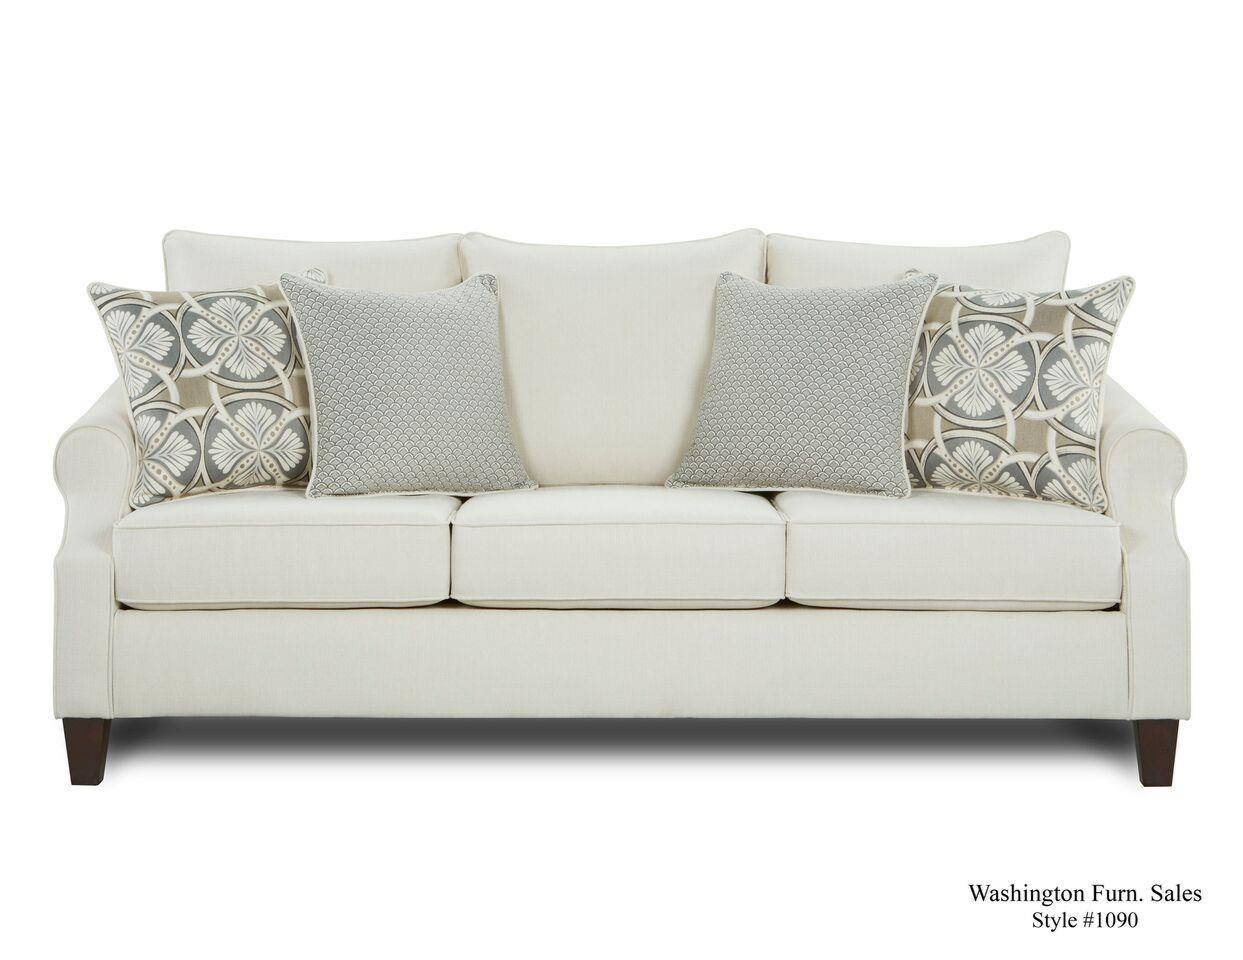 Washington Furniture 1093 Sofa